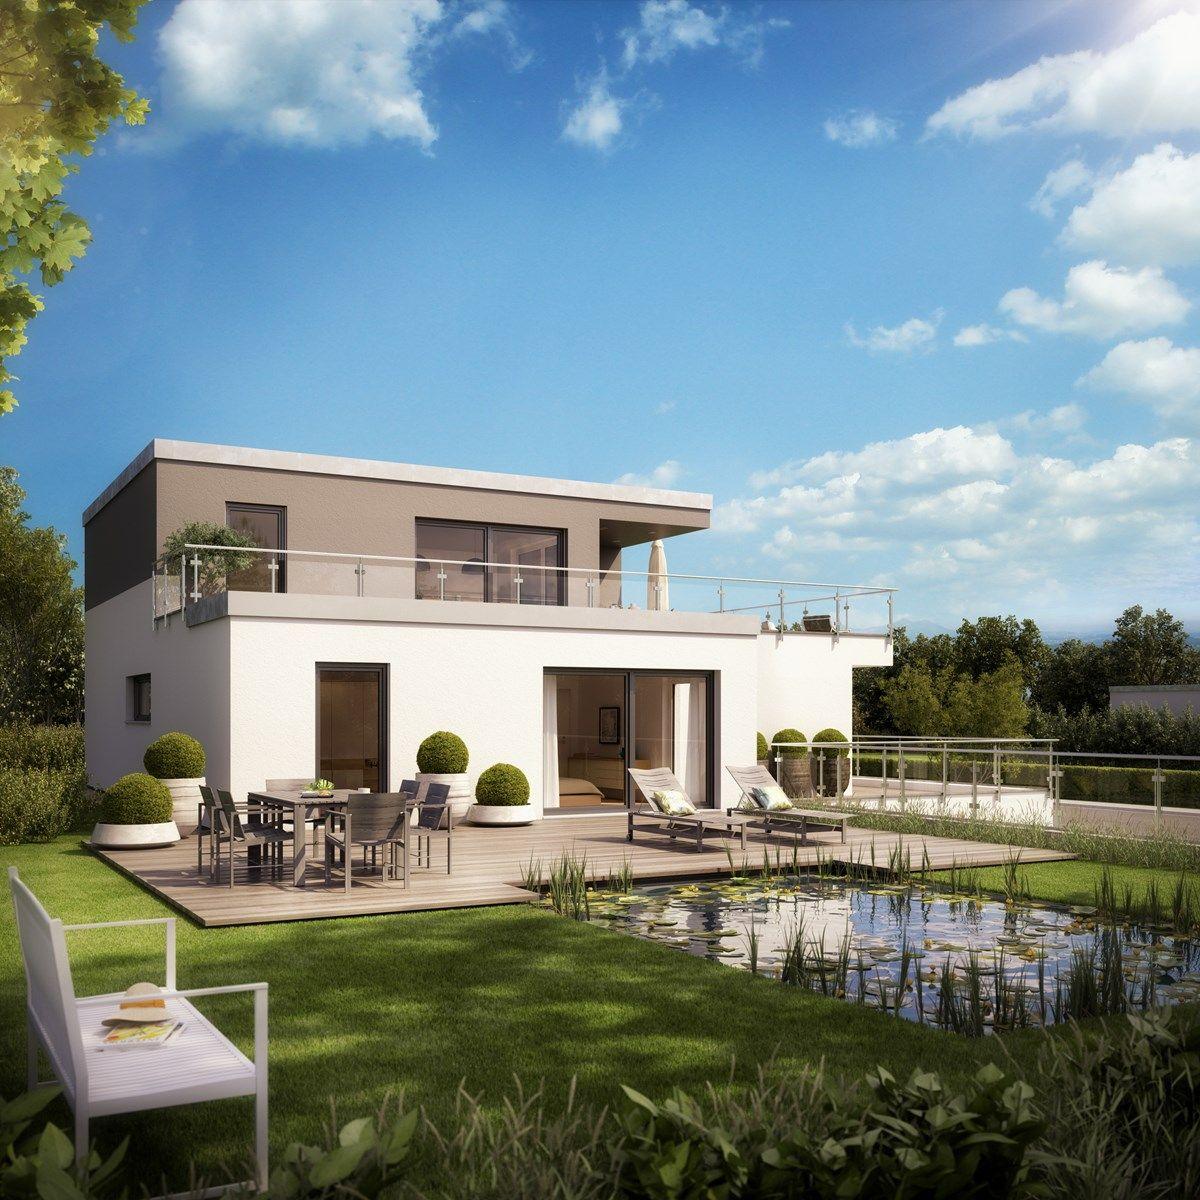 Massiv bauen Bauhaus Style | shipping container homes | Pinterest ...